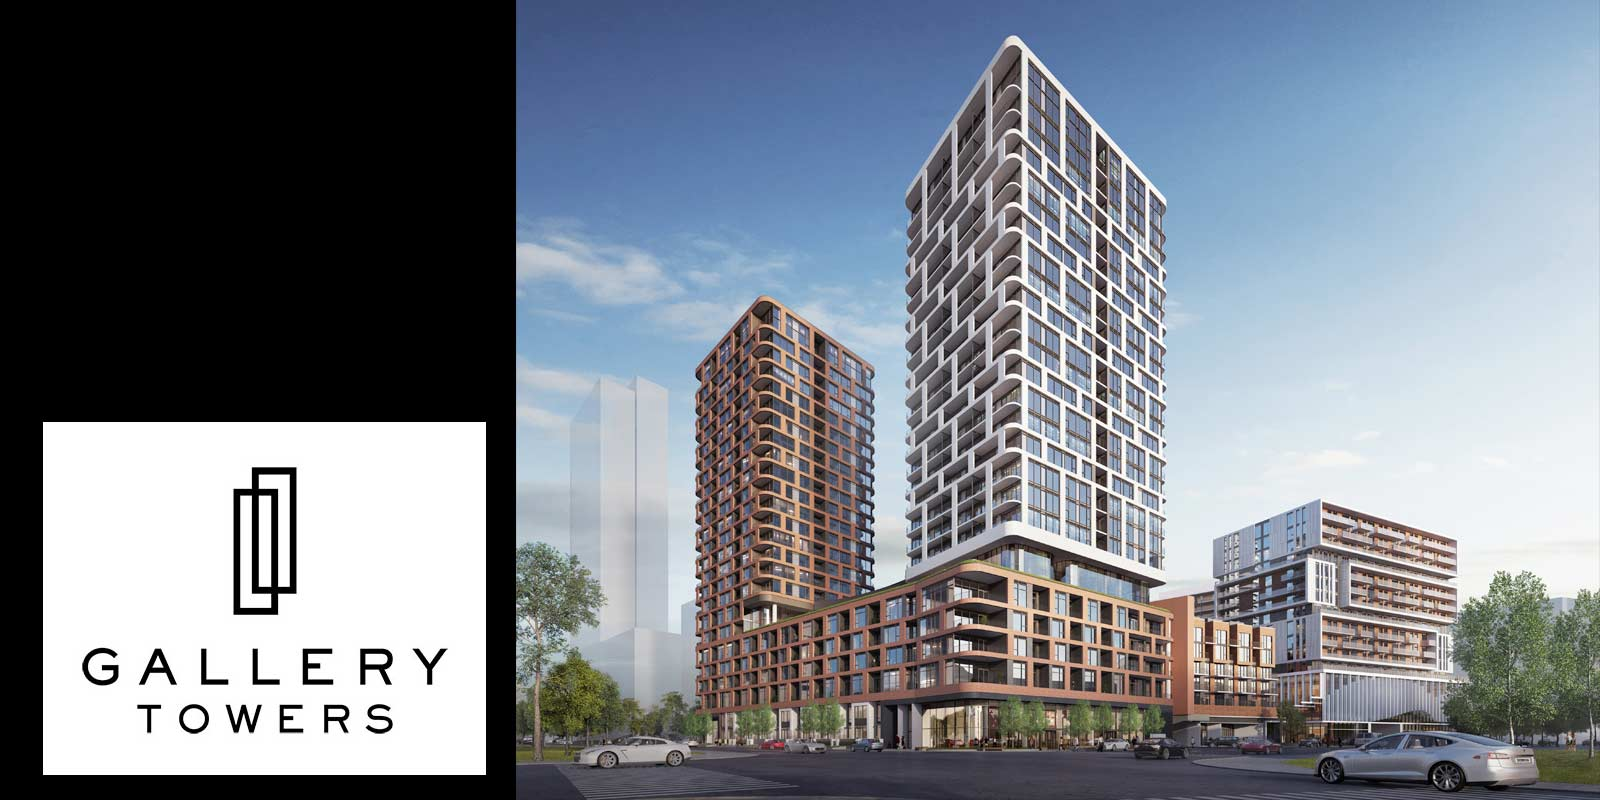 Coming Soon: Gallery Towers